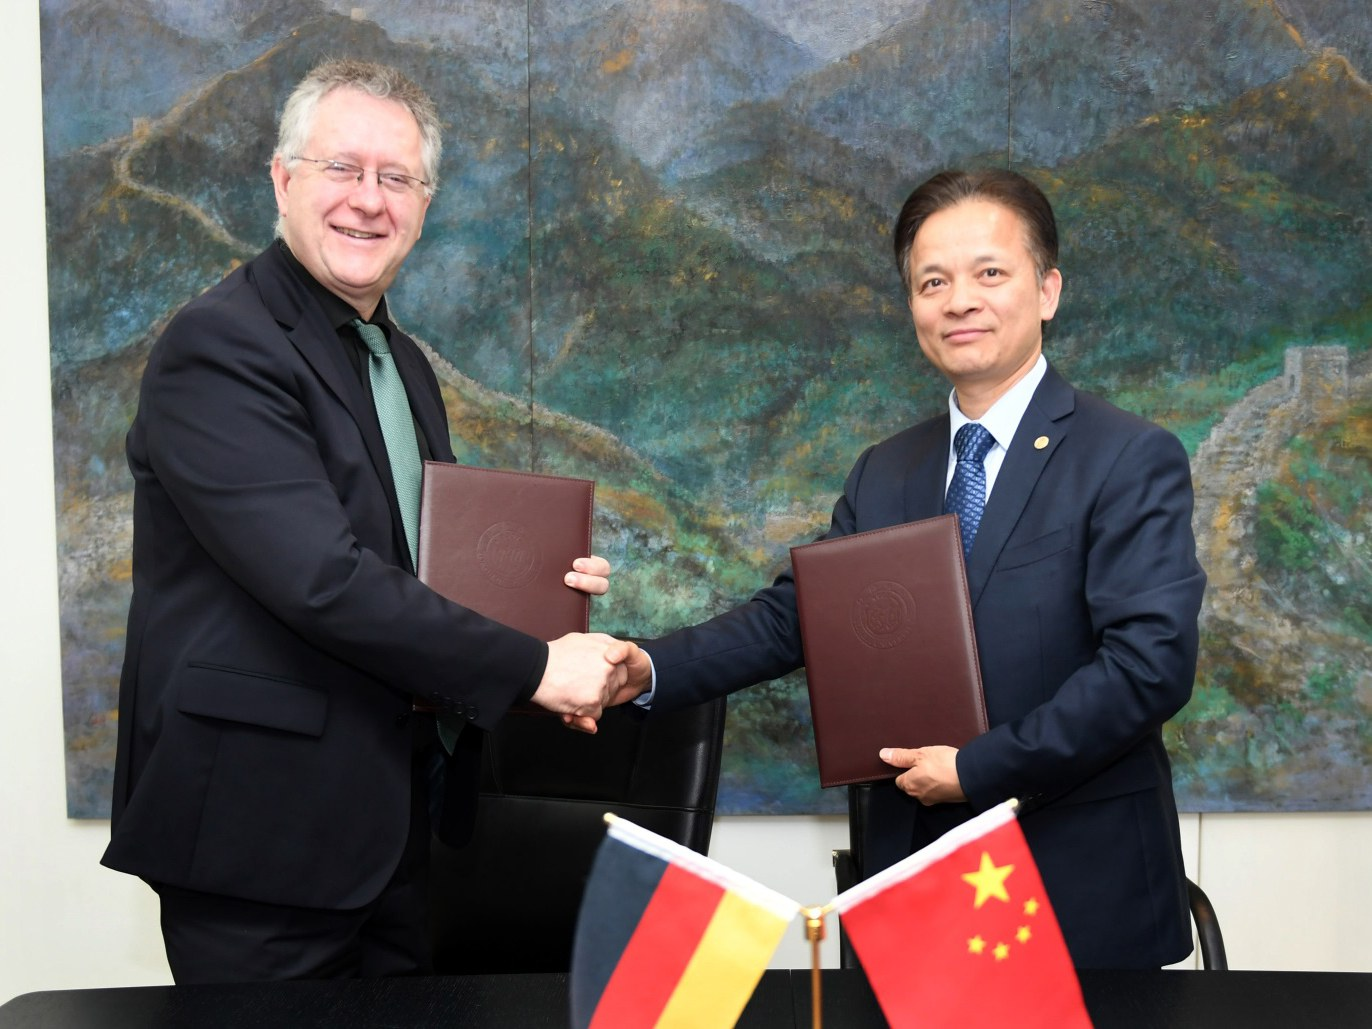 Rektor Prof. Dr. Michael Hoch und Präsident Prof. Dr. Zhihua Zhong (Tongji University)